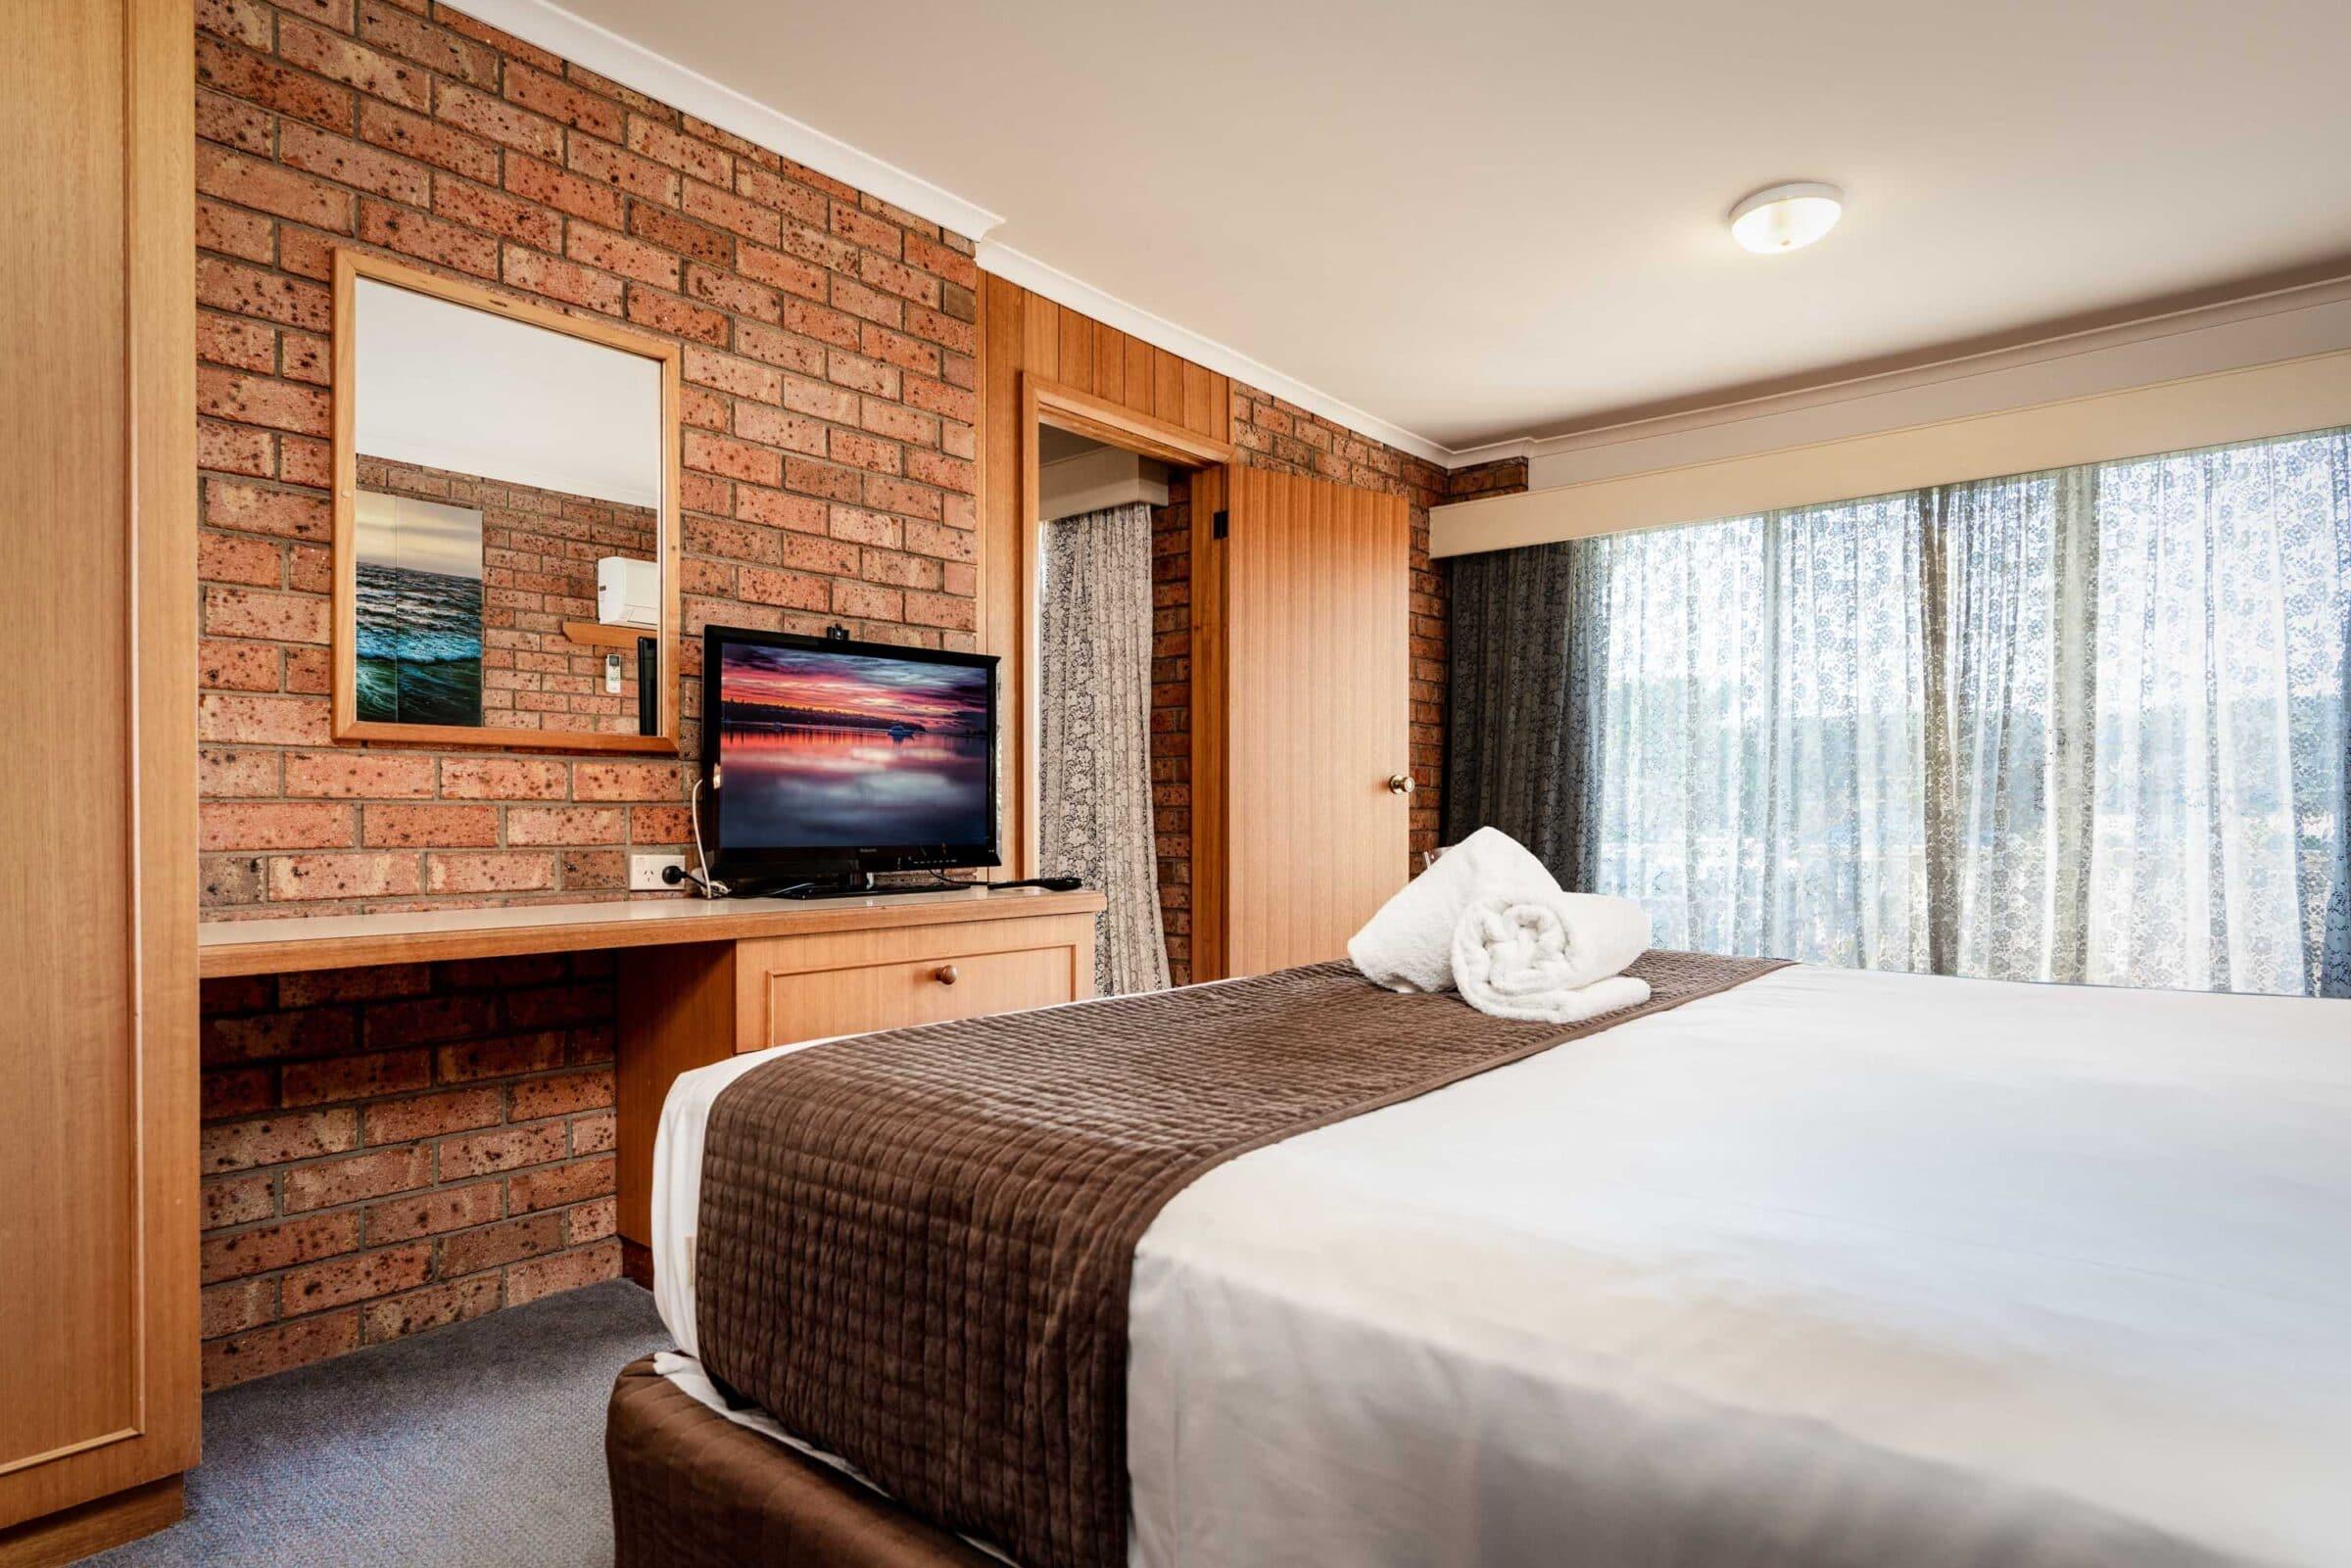 11-Main Bedroom-11 Small Suite Merimbula Motel Accommodation - Comfort Inn Merimbula